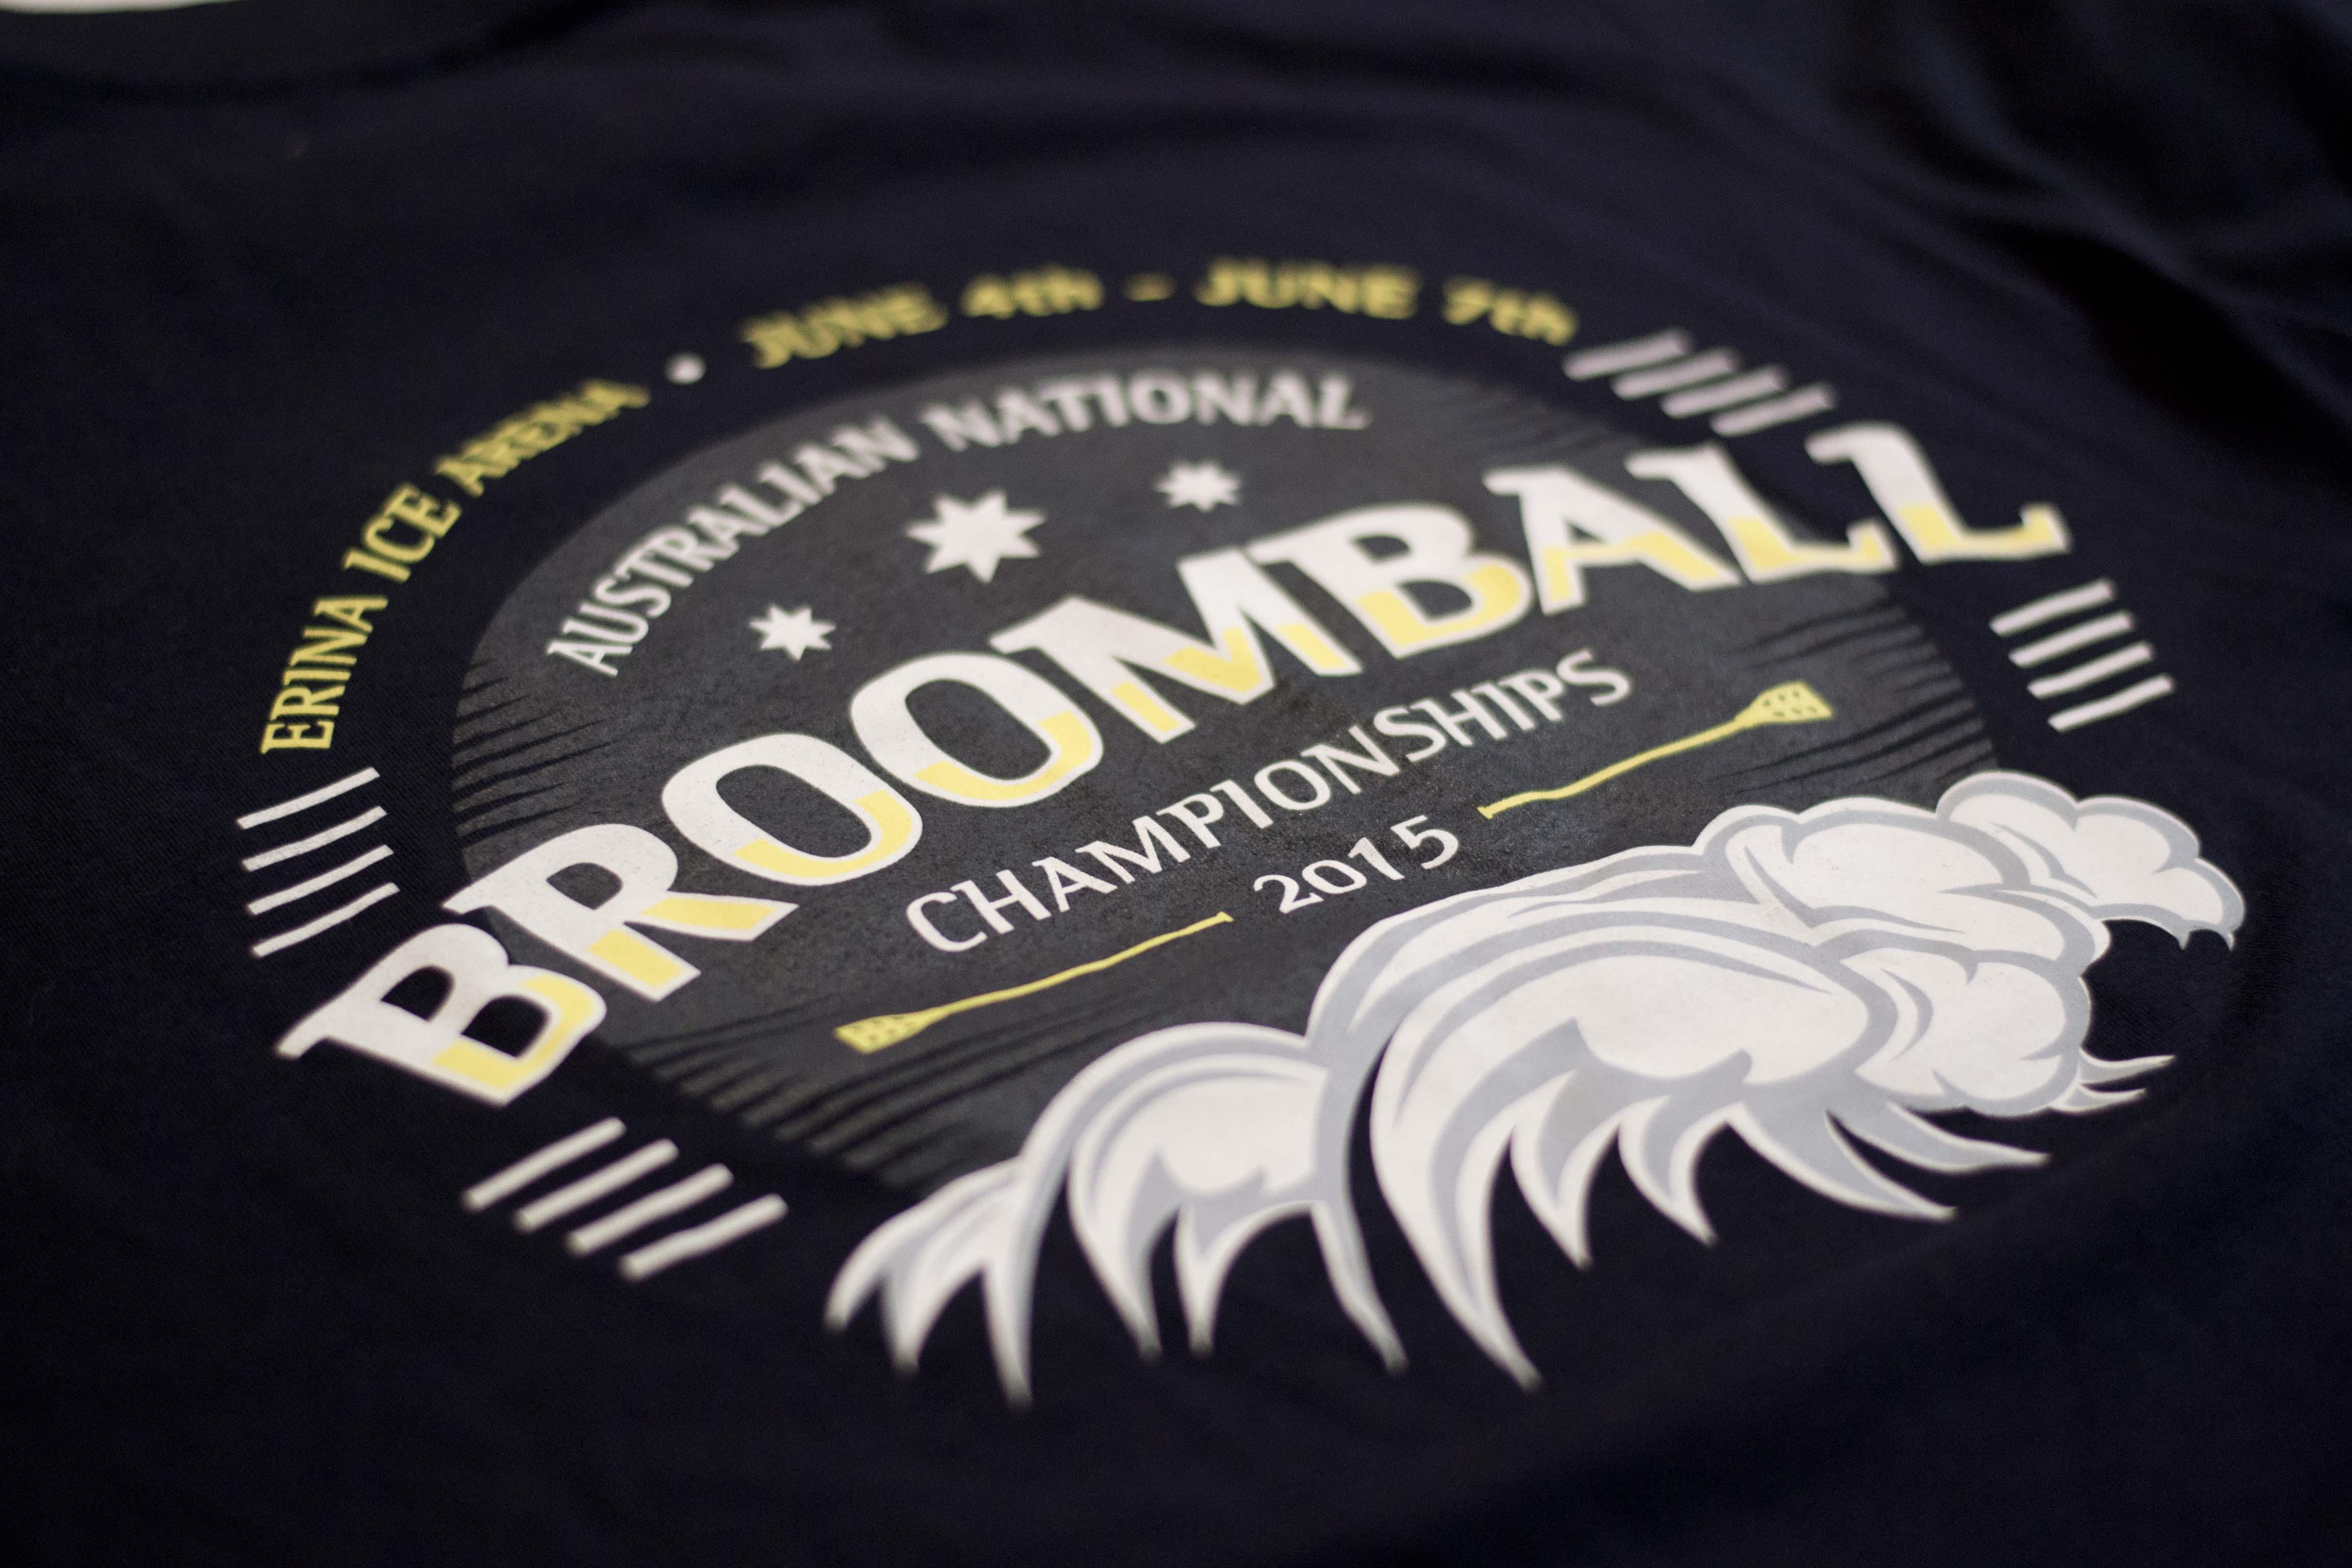 2015 Australian National Broomball Championship shirt